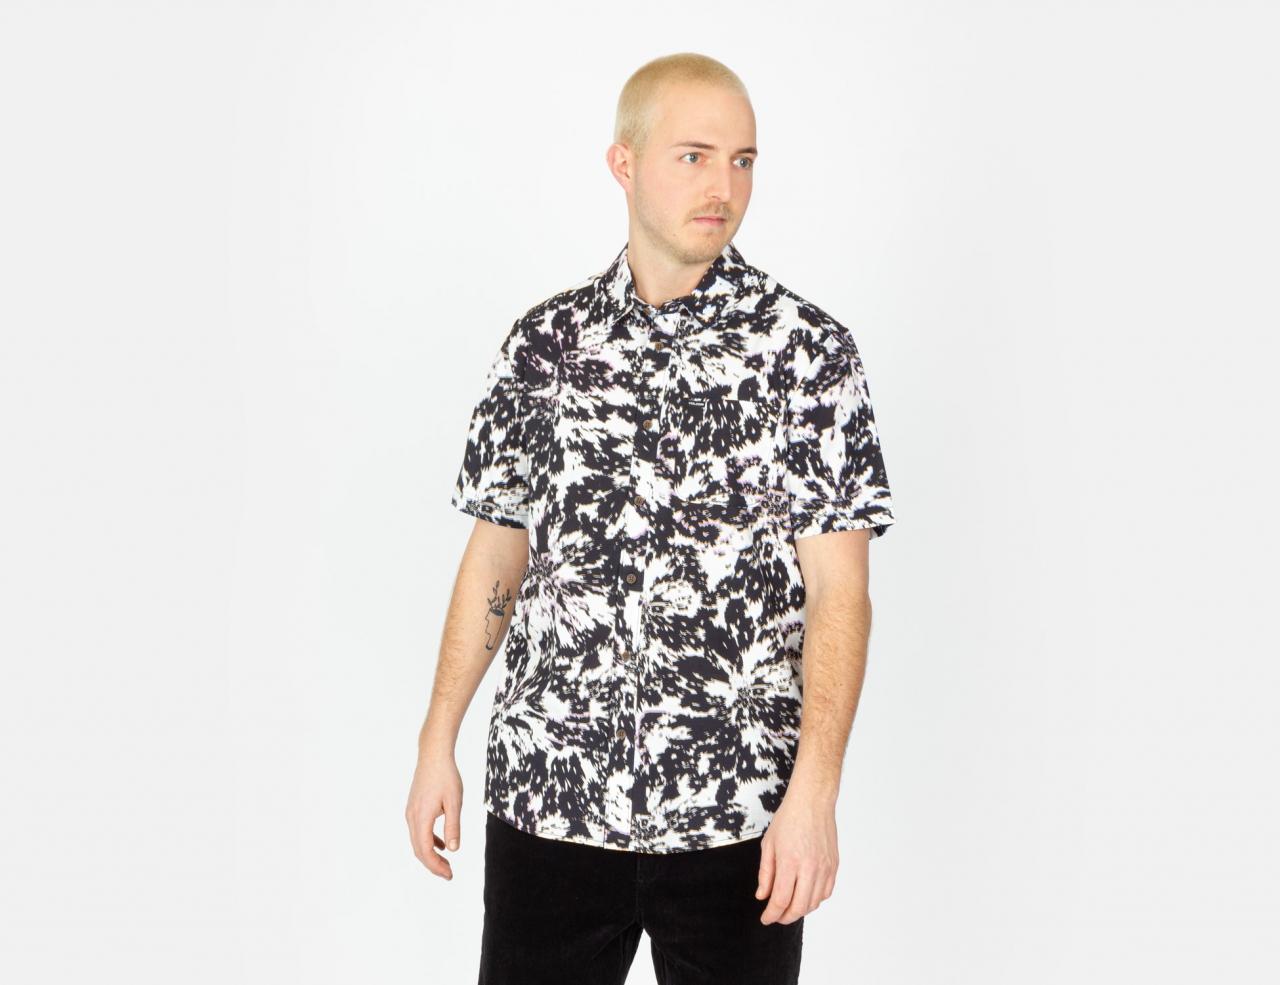 Volcom Striver S/S Shirt - White